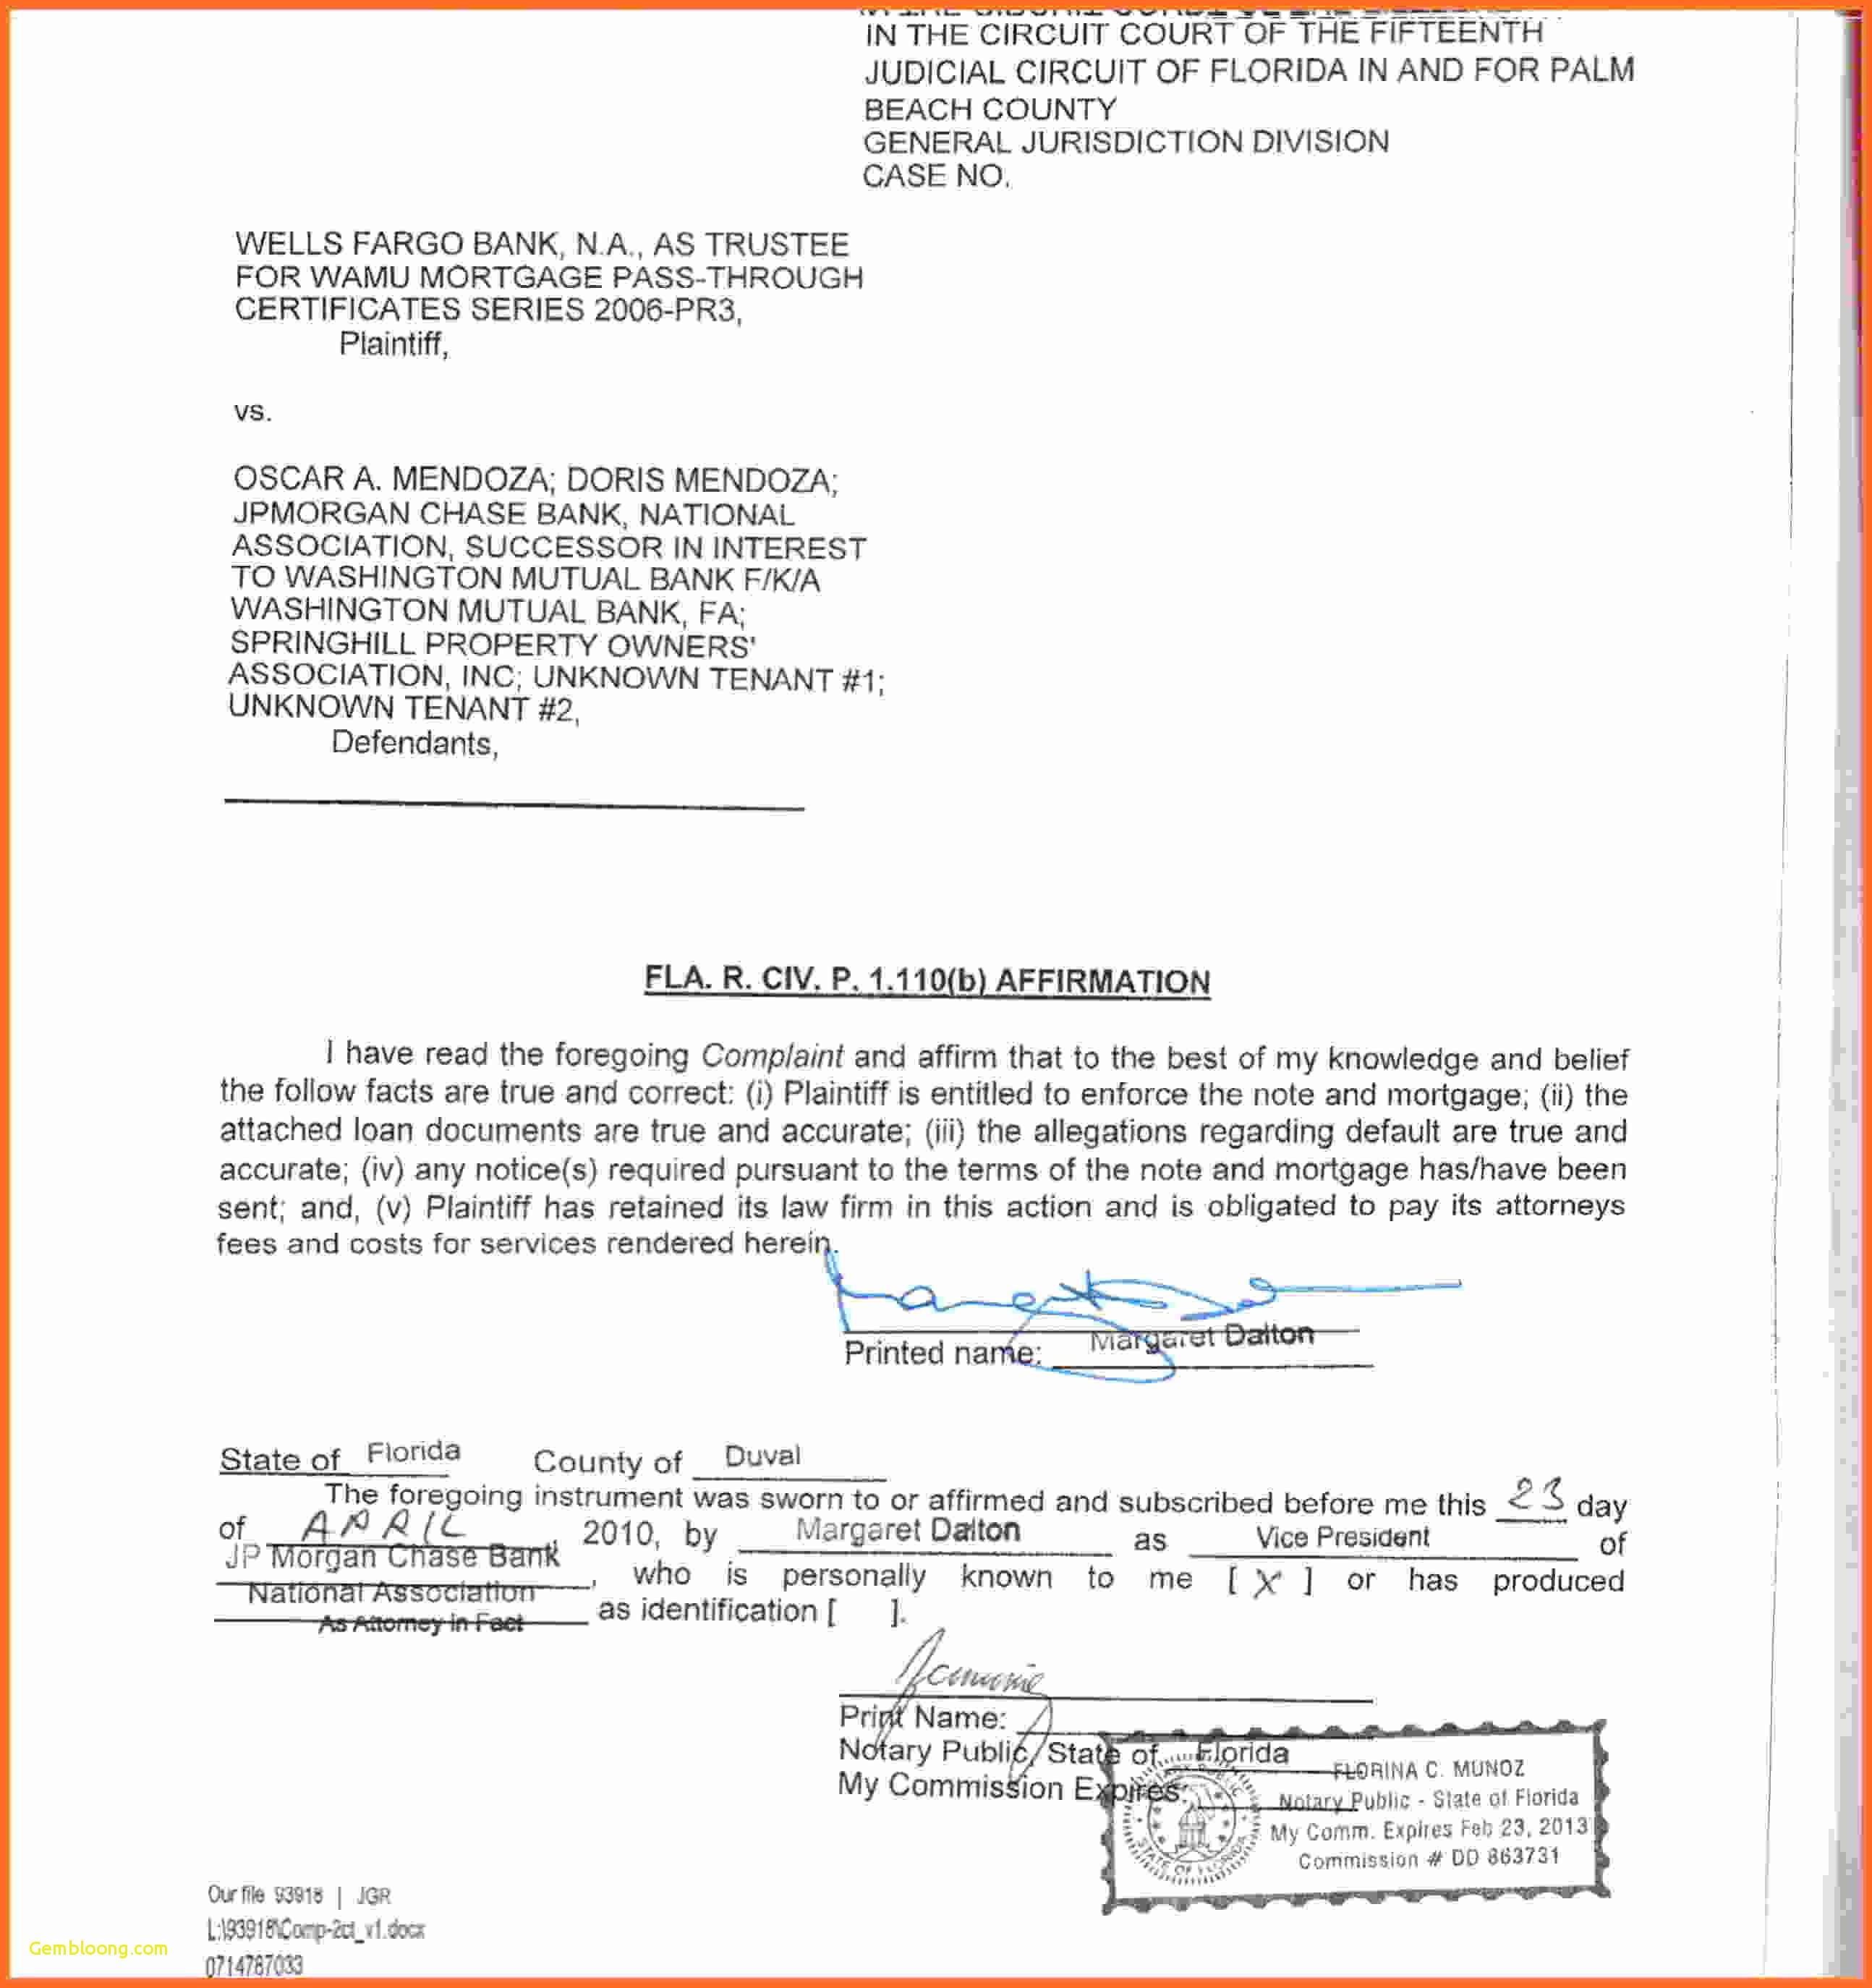 Notary Acknowledgement Form Minnesota